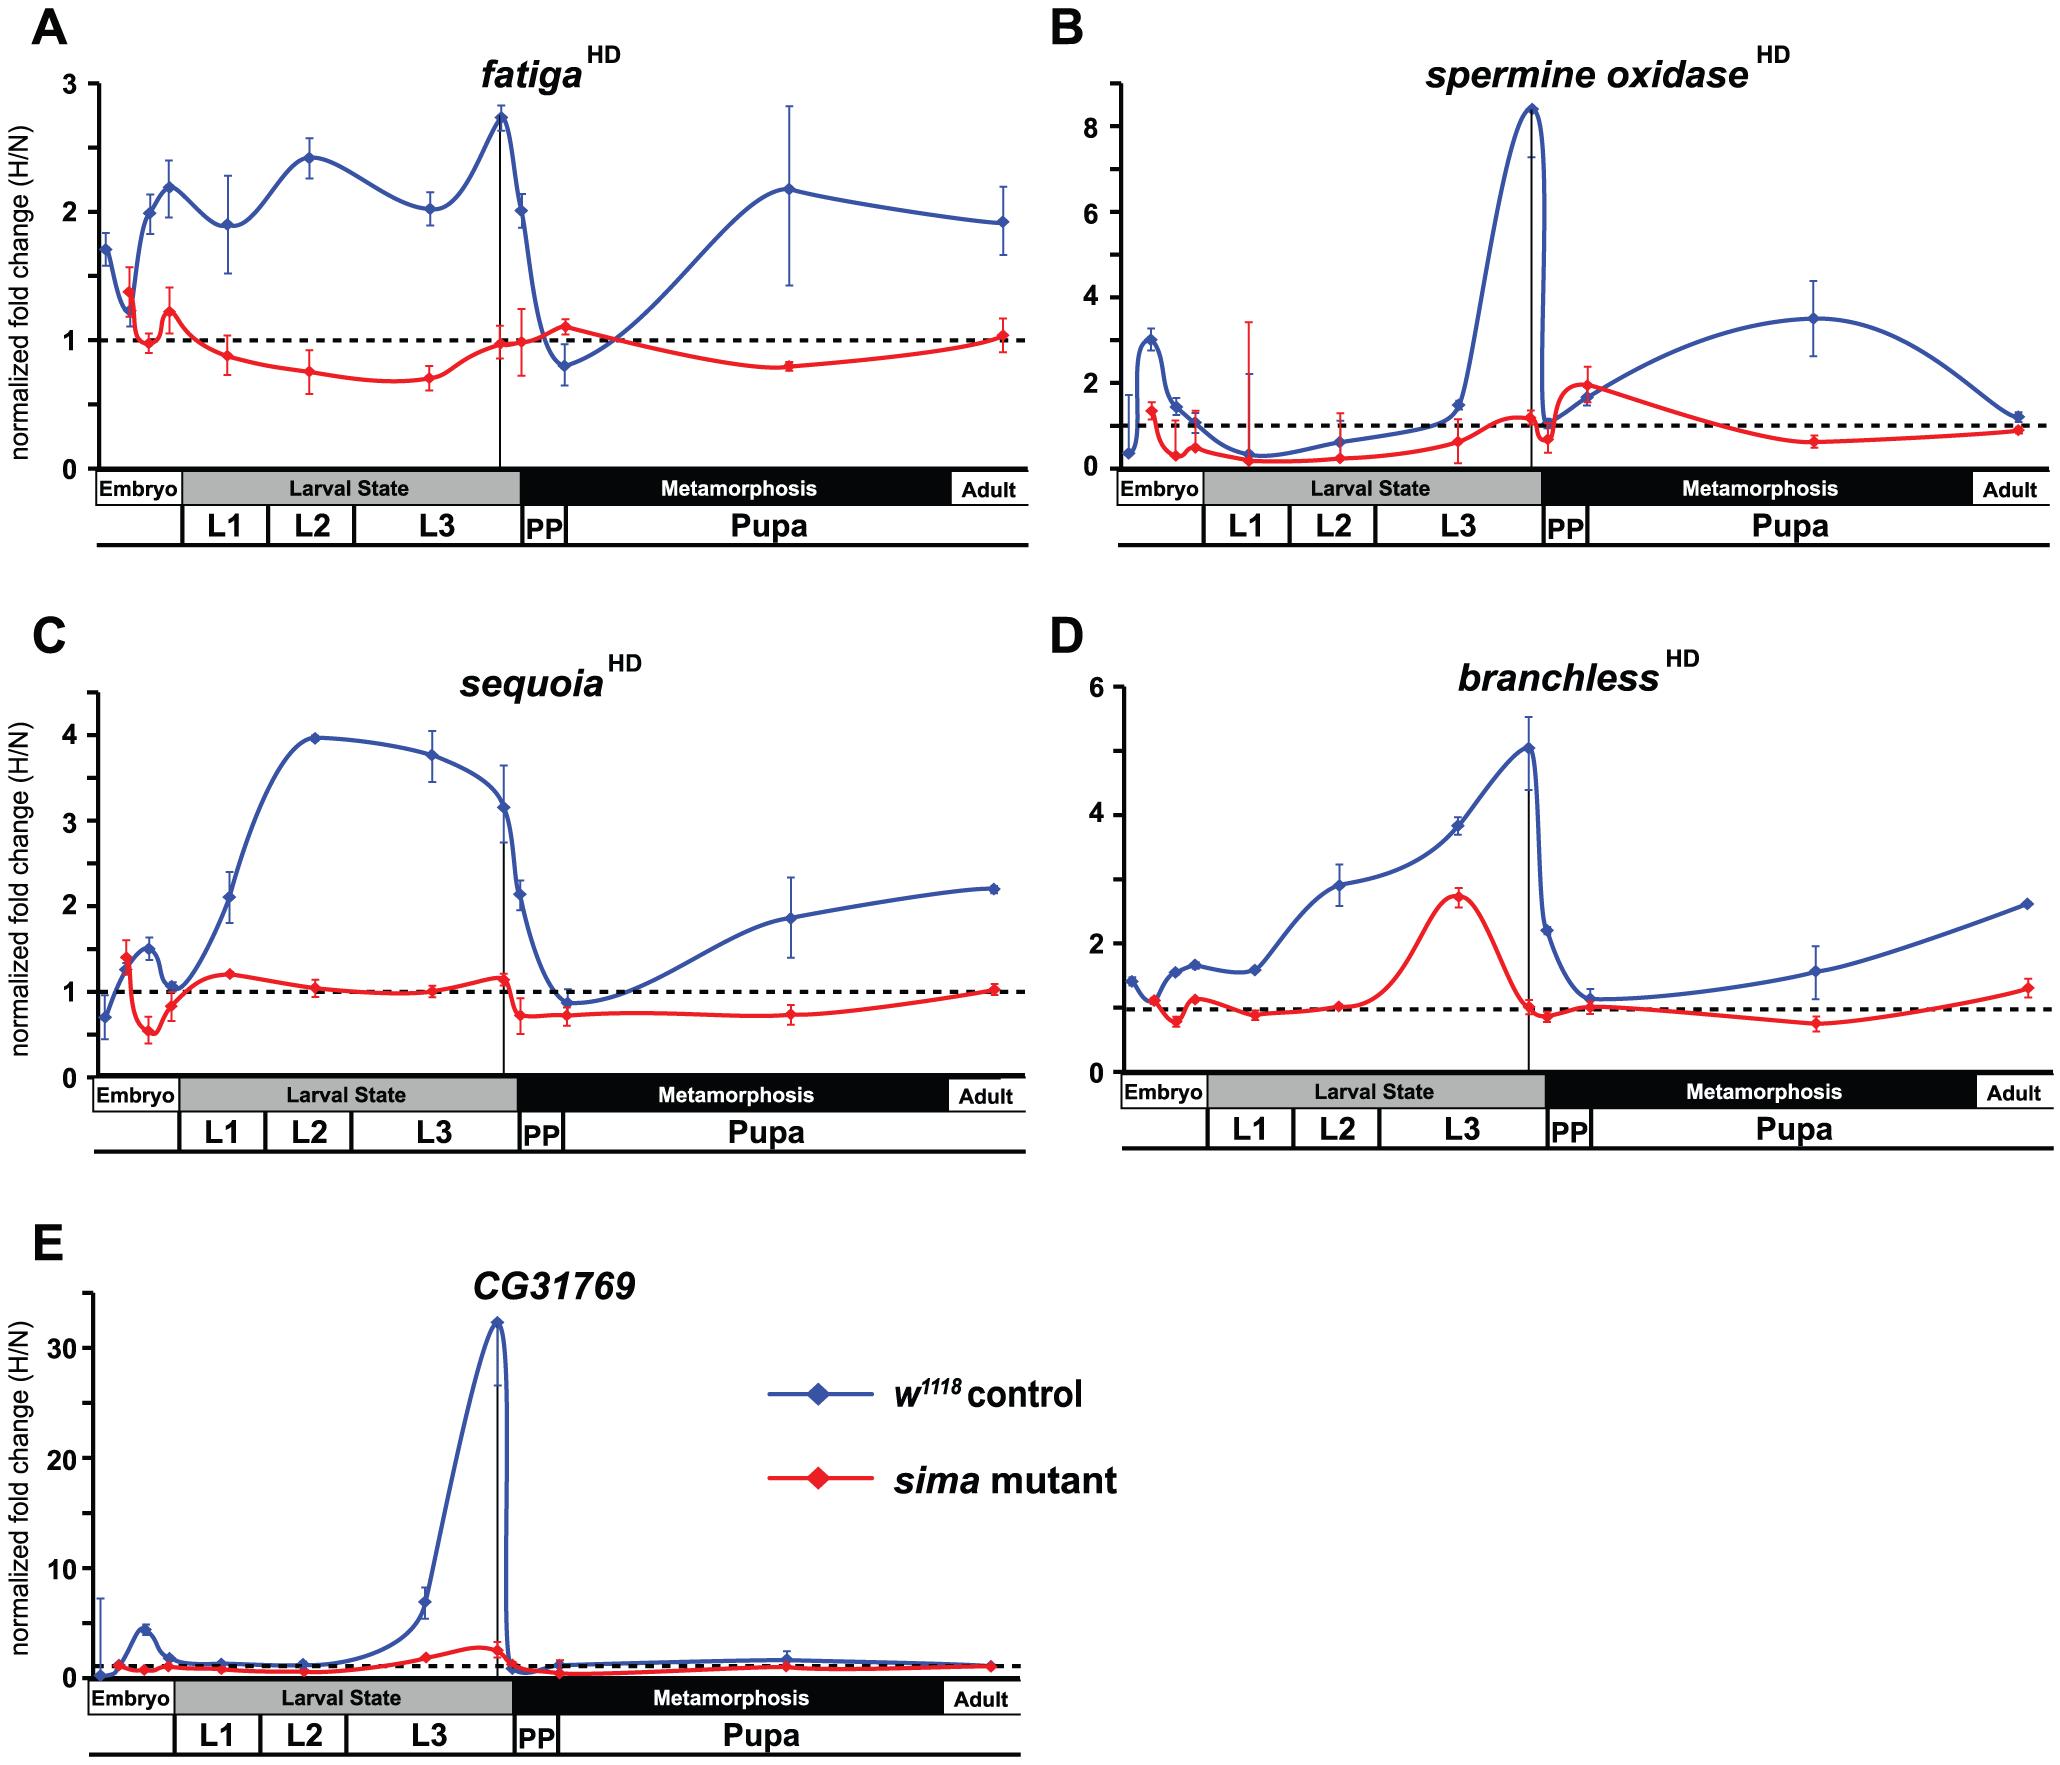 Temporal expression of HIF-dependent hypoxic response genes.